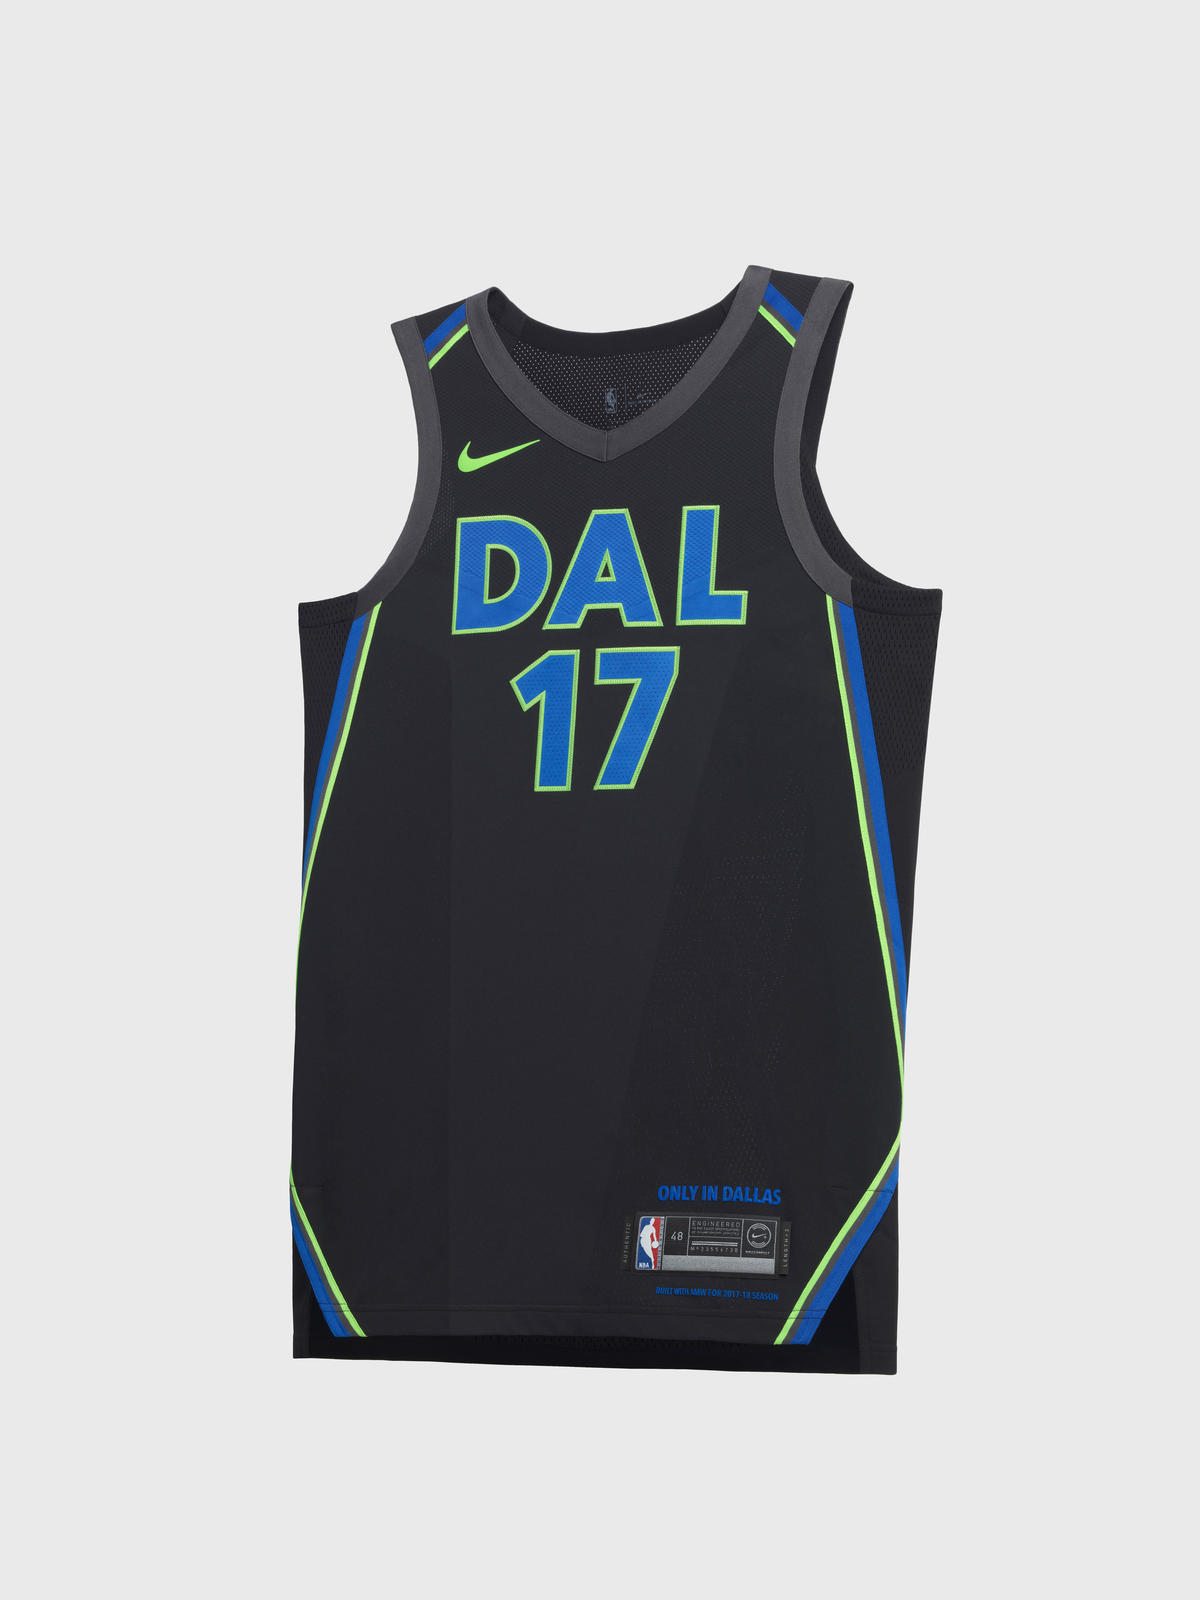 Nike_NBA_City_Edition_Uniform_Dallas_Mavericks_0155_native_1600